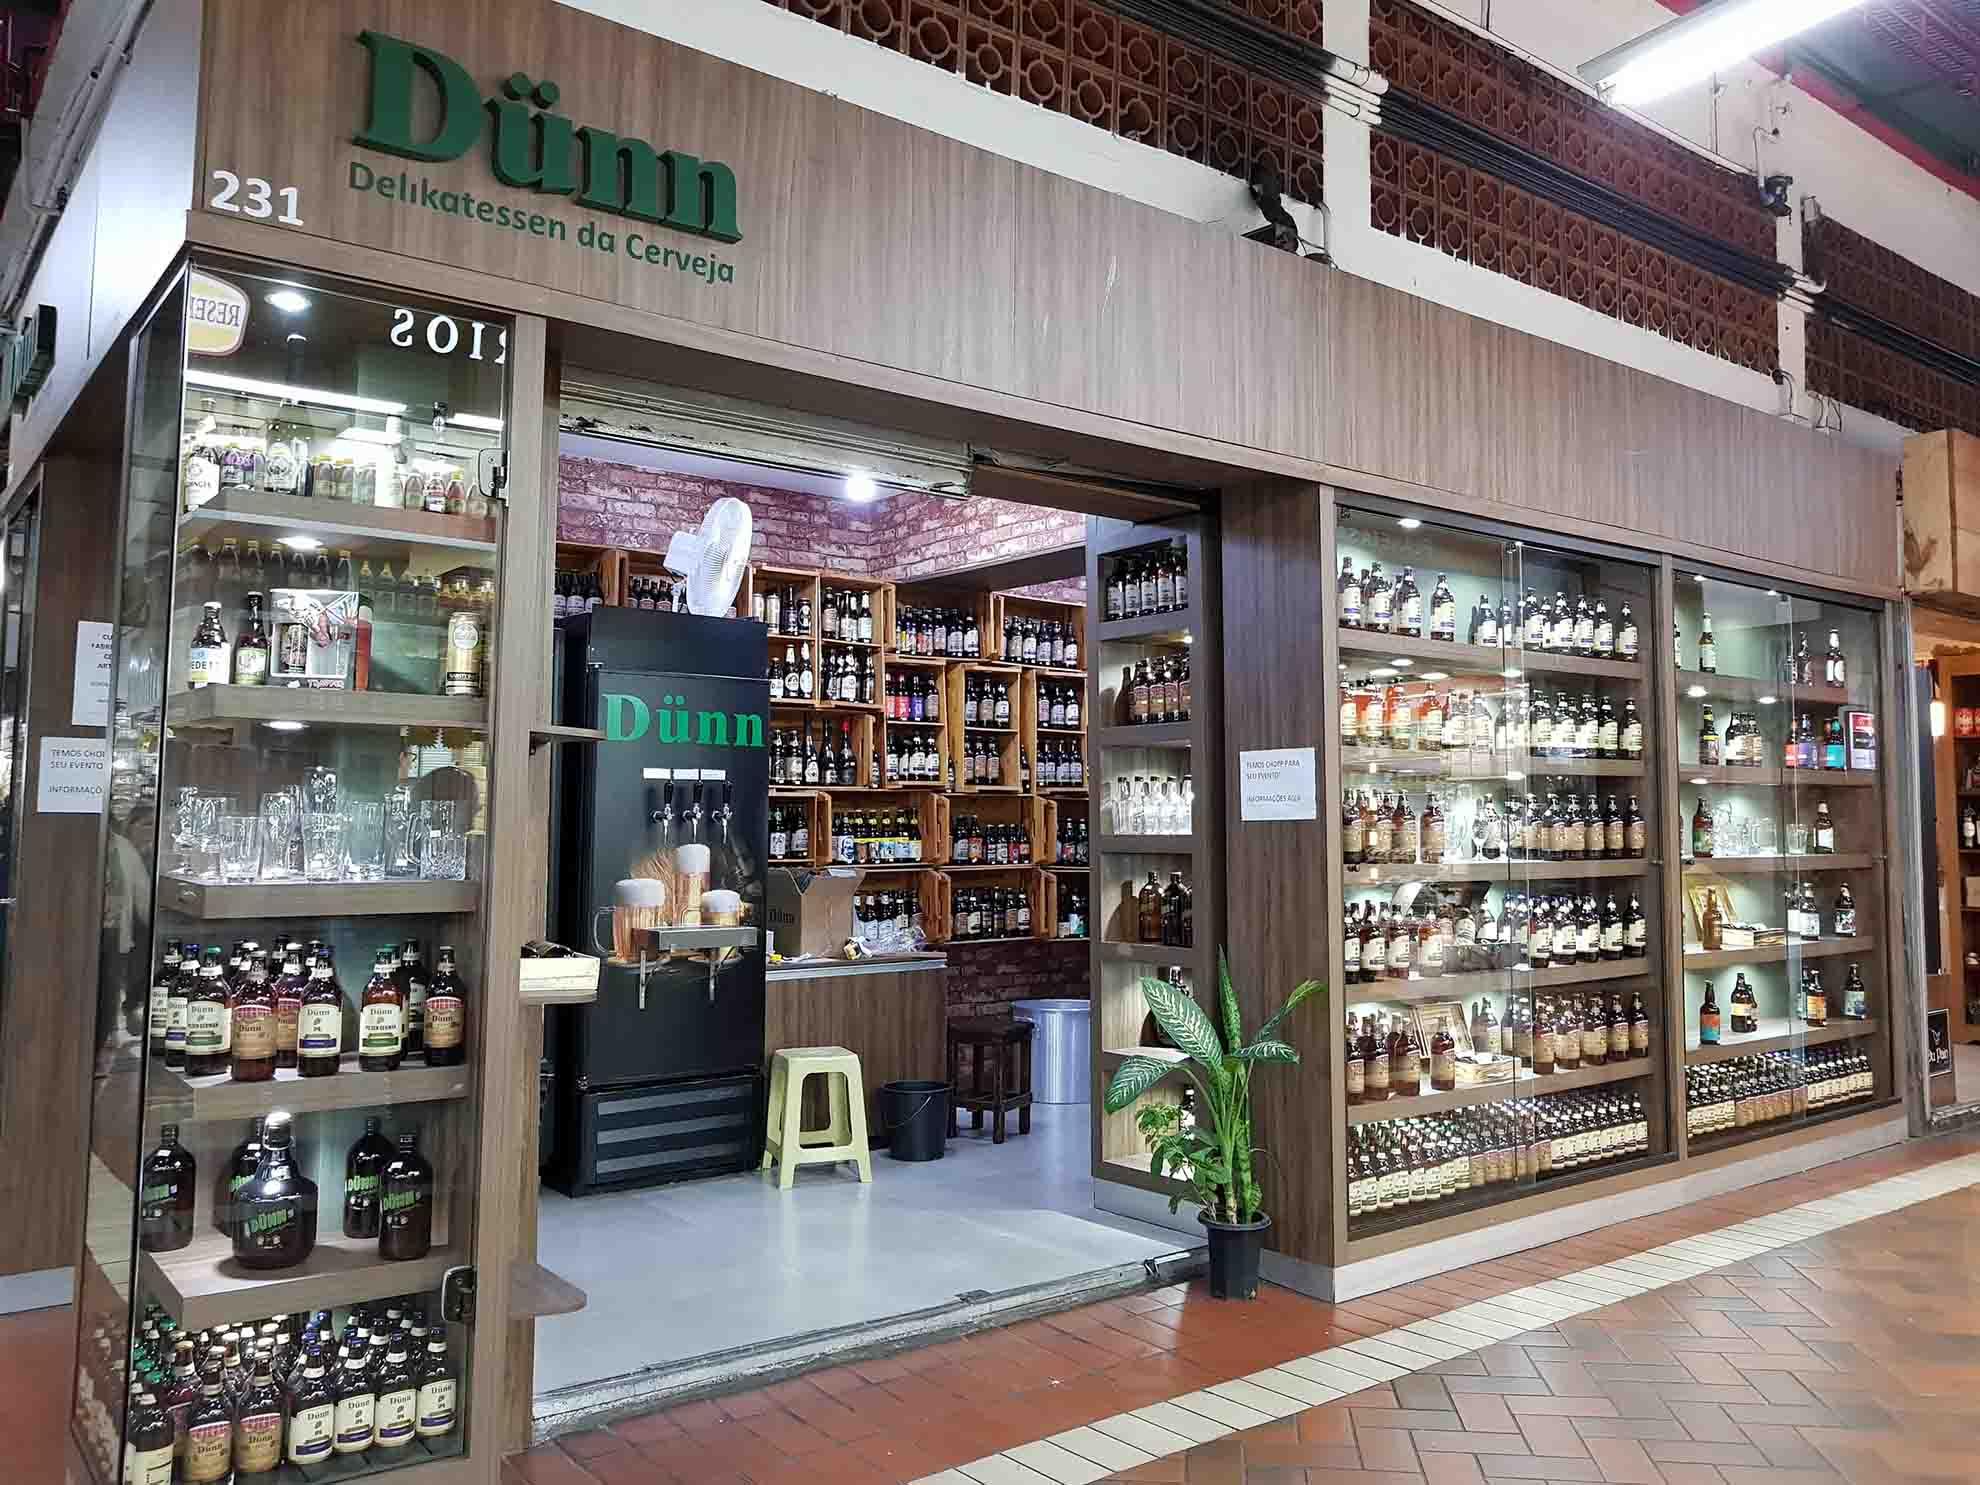 Dünn Cervejaria | Foto: Marden Couto / Turismo de Minas